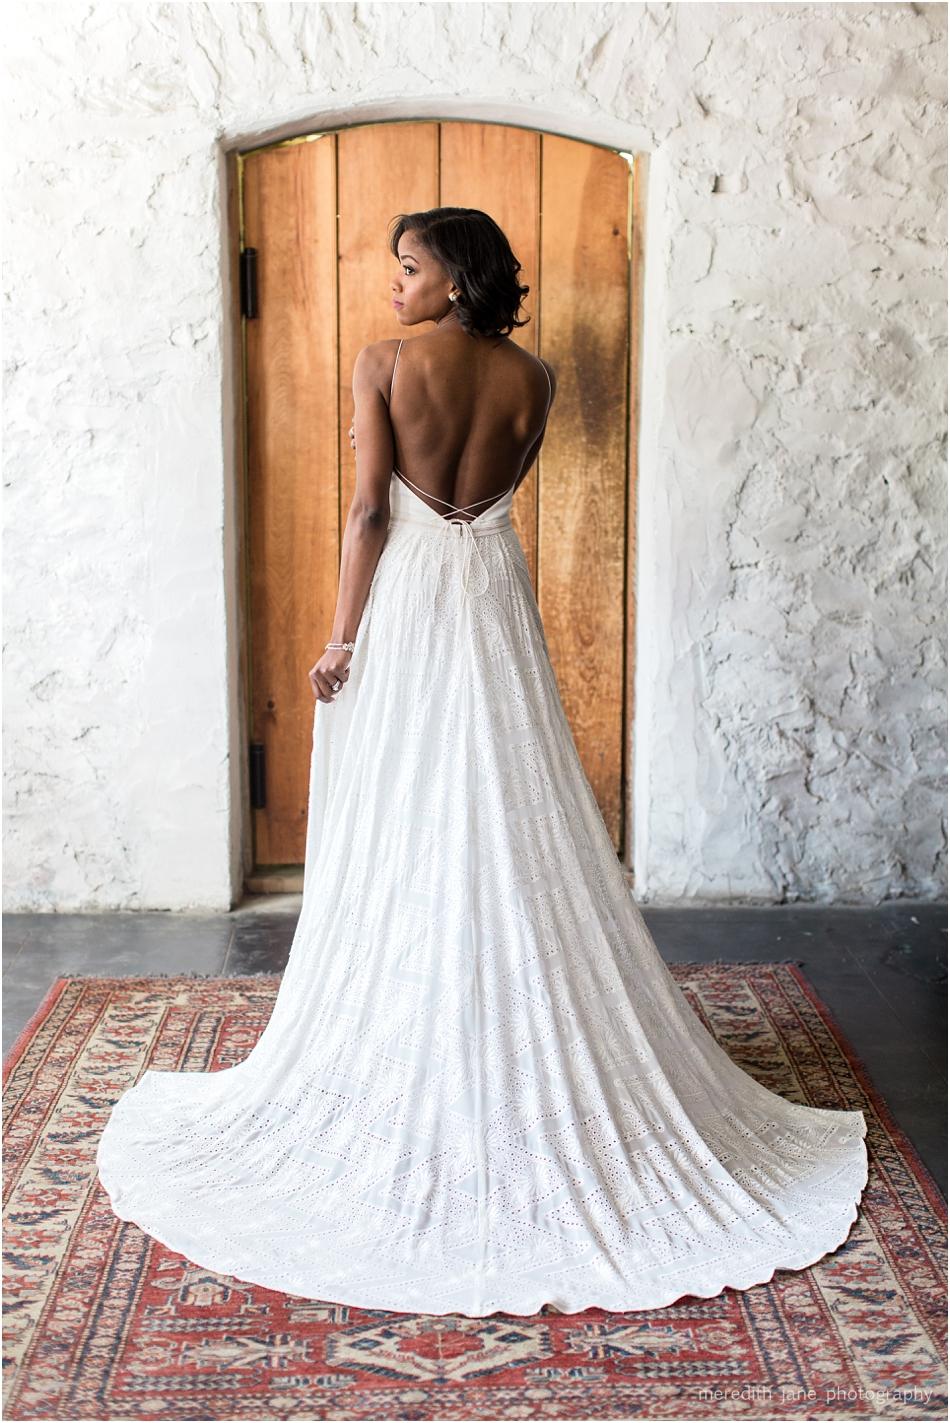 gedney_farm_styled_boston_massachusetts_cape_cod_new_england_wedding_photographer_Meredith_Jane_Photography_photo_1231.jpg